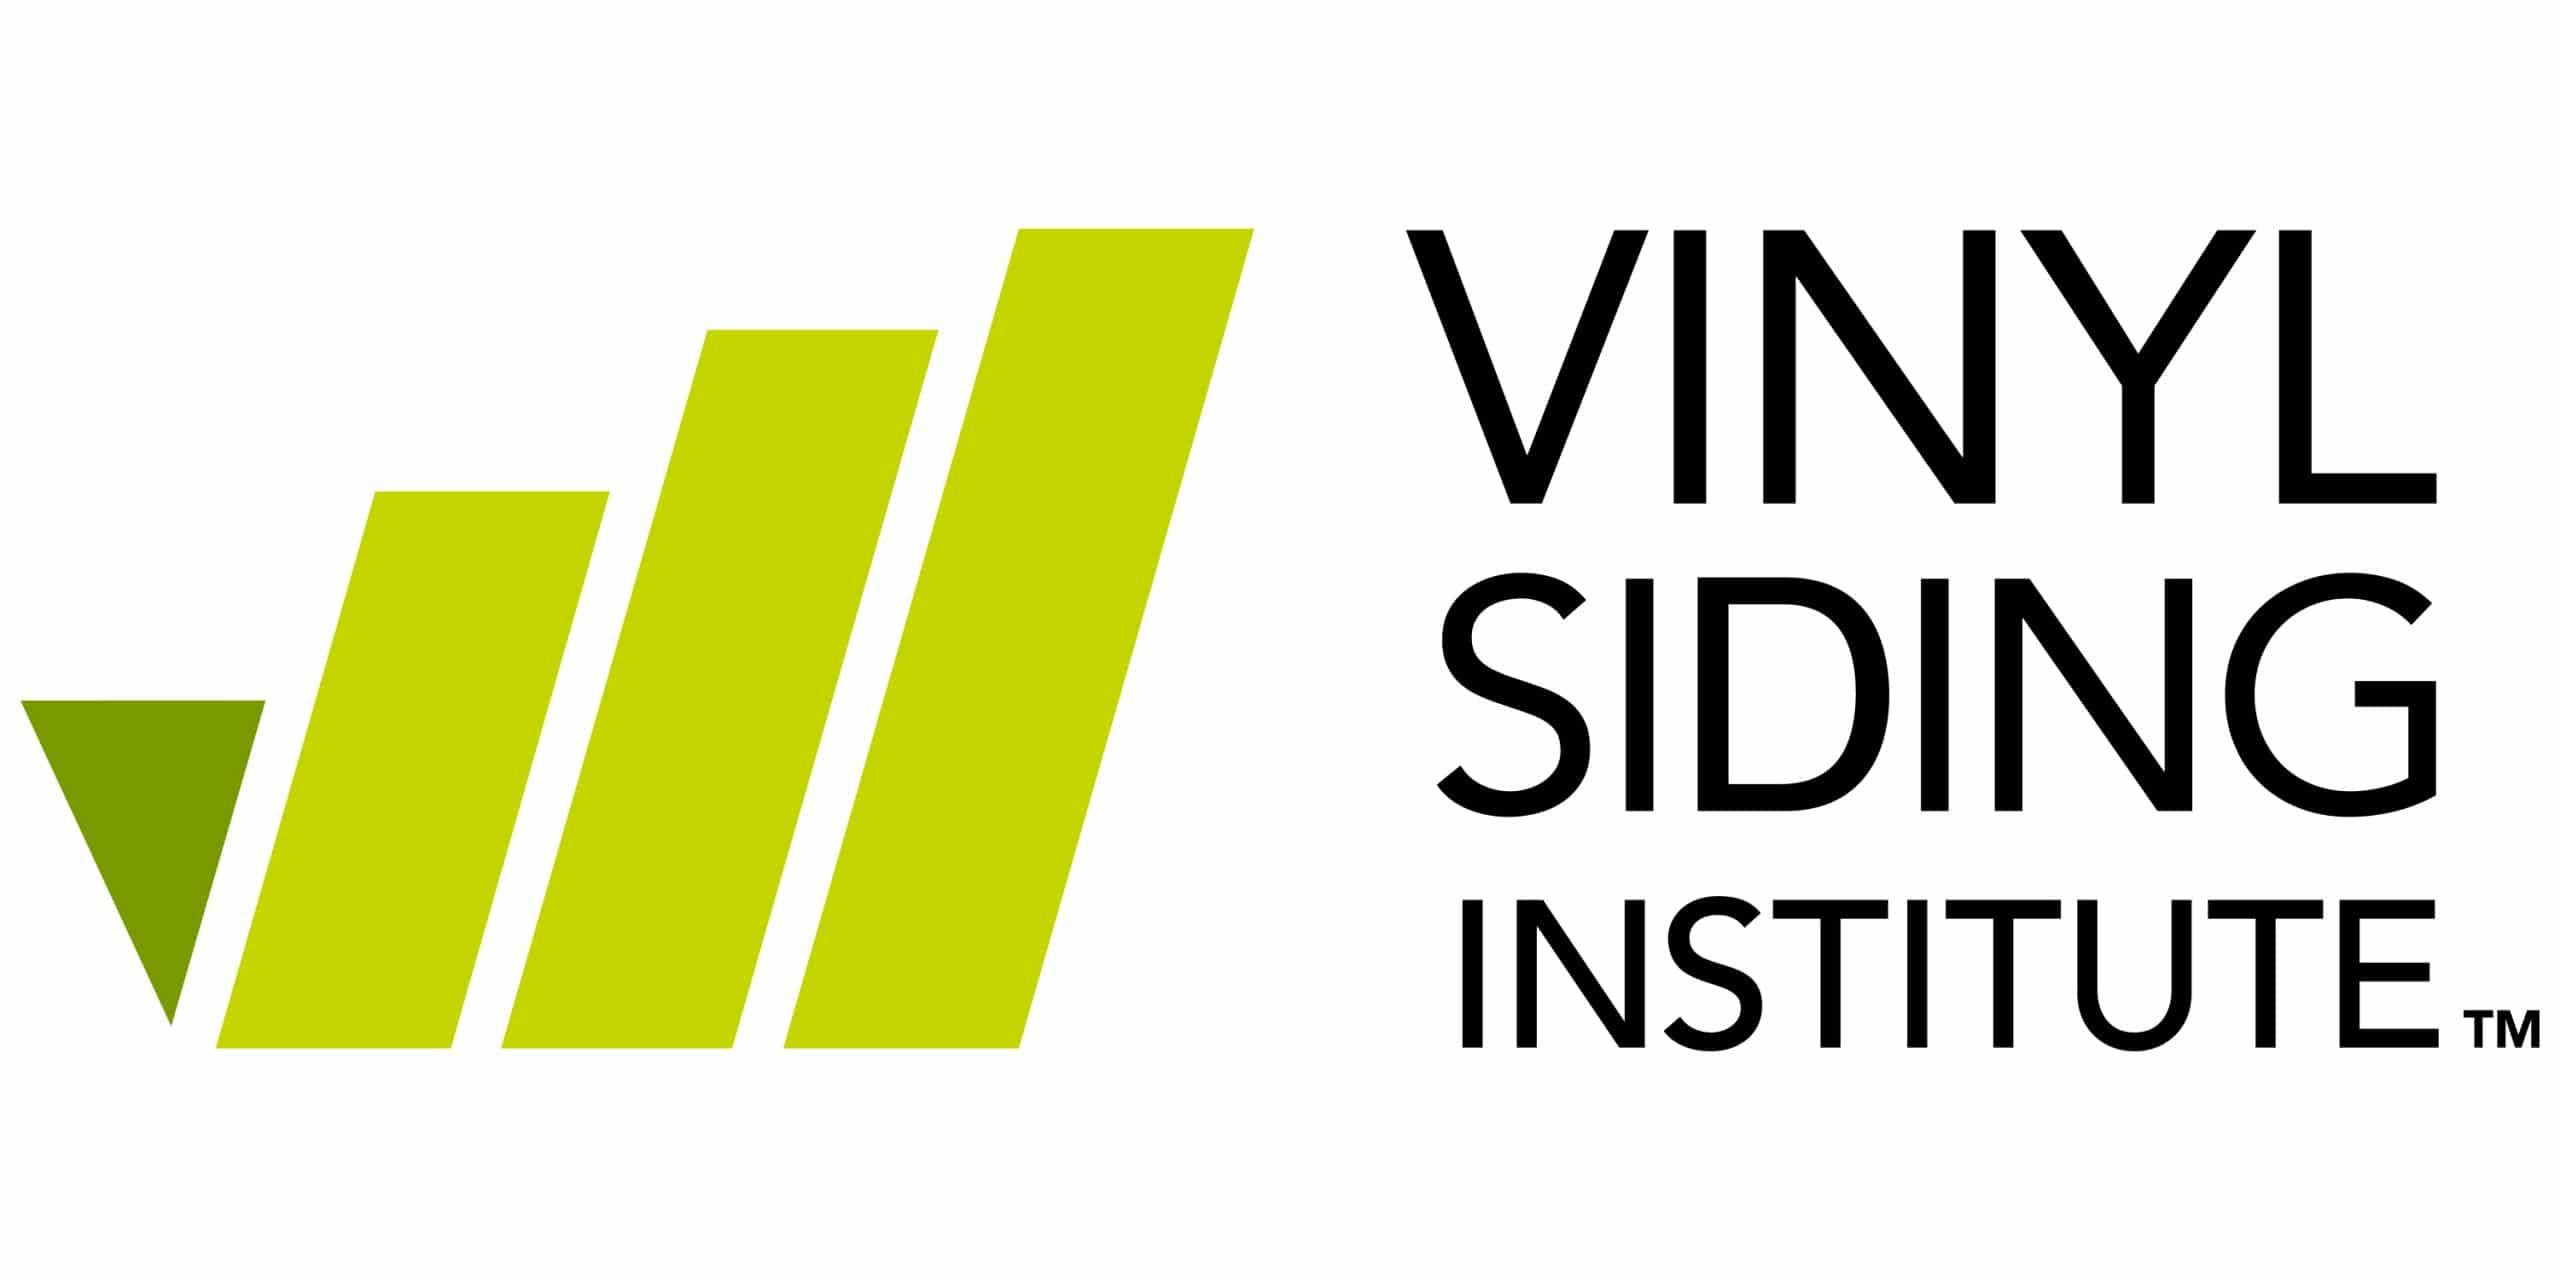 Vinyl Siding Institute logo